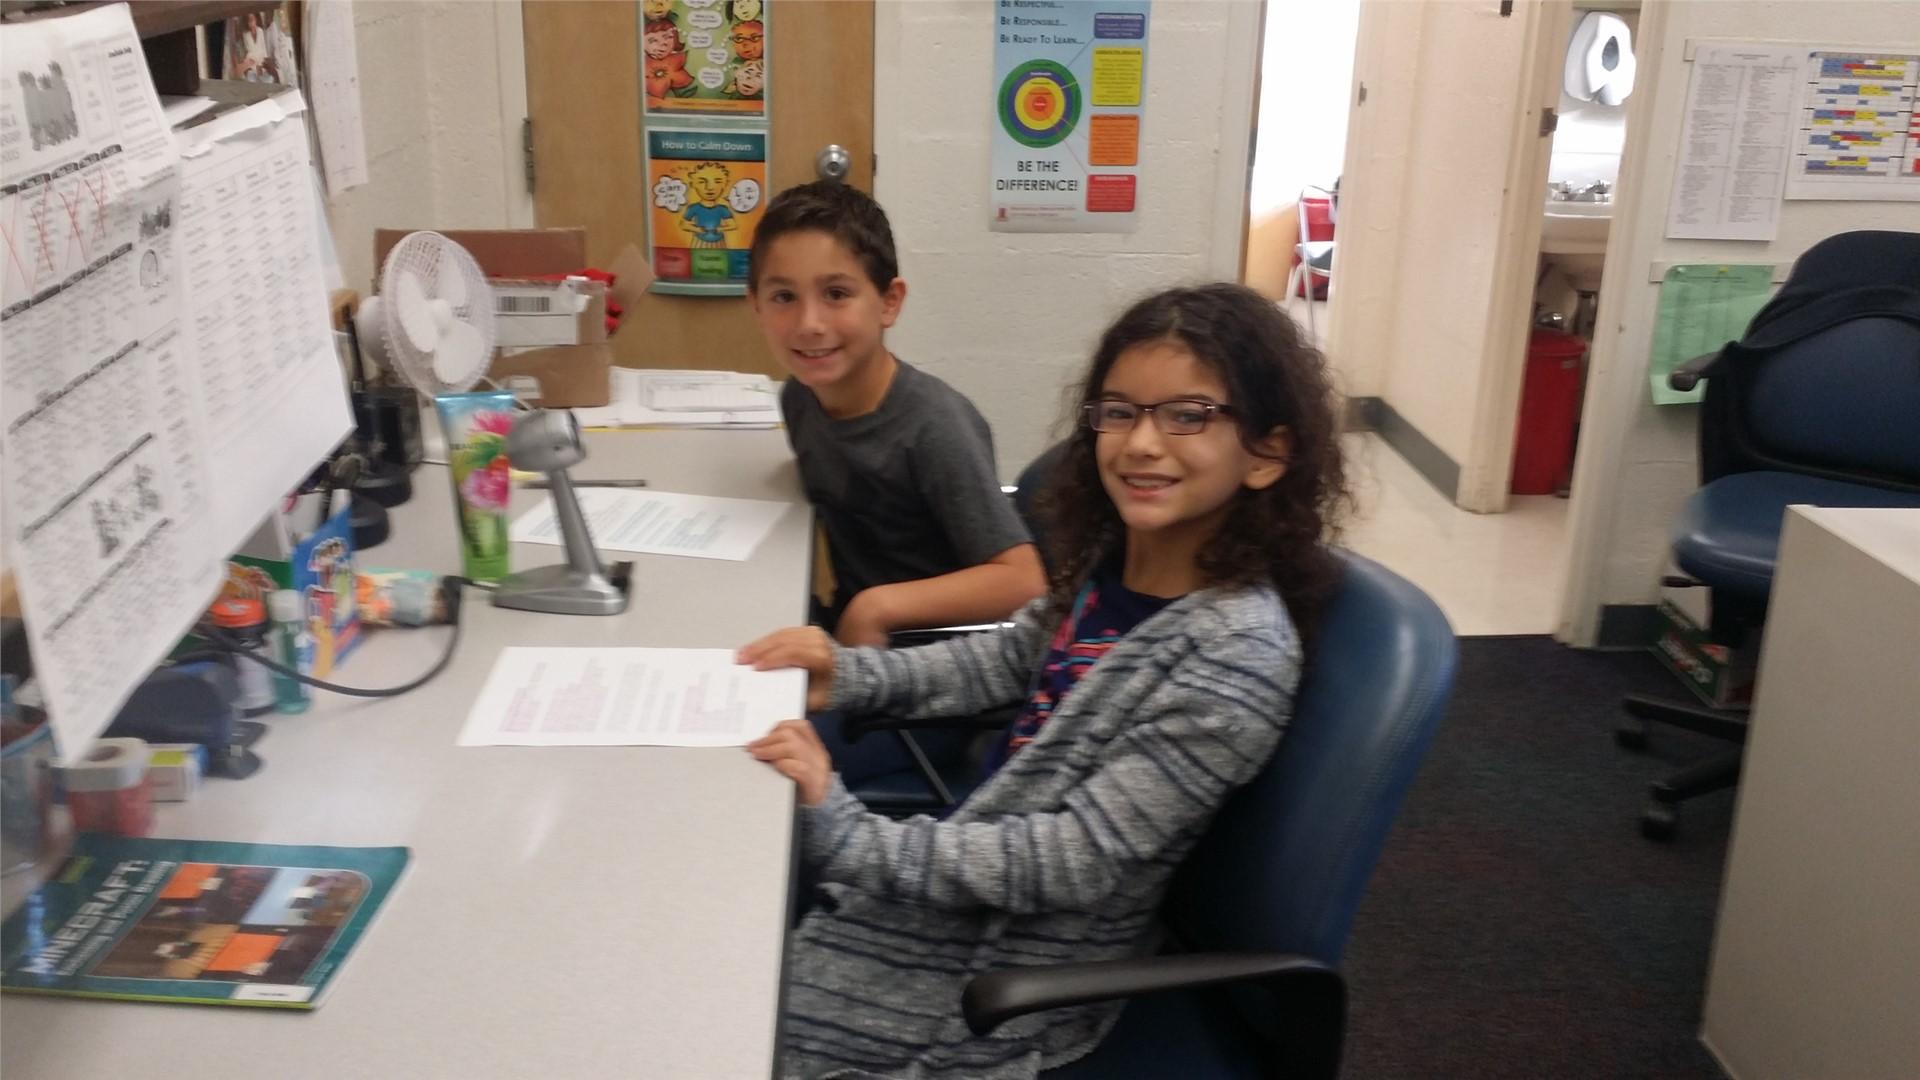 November 7-11, Alana A. & Jacob E.